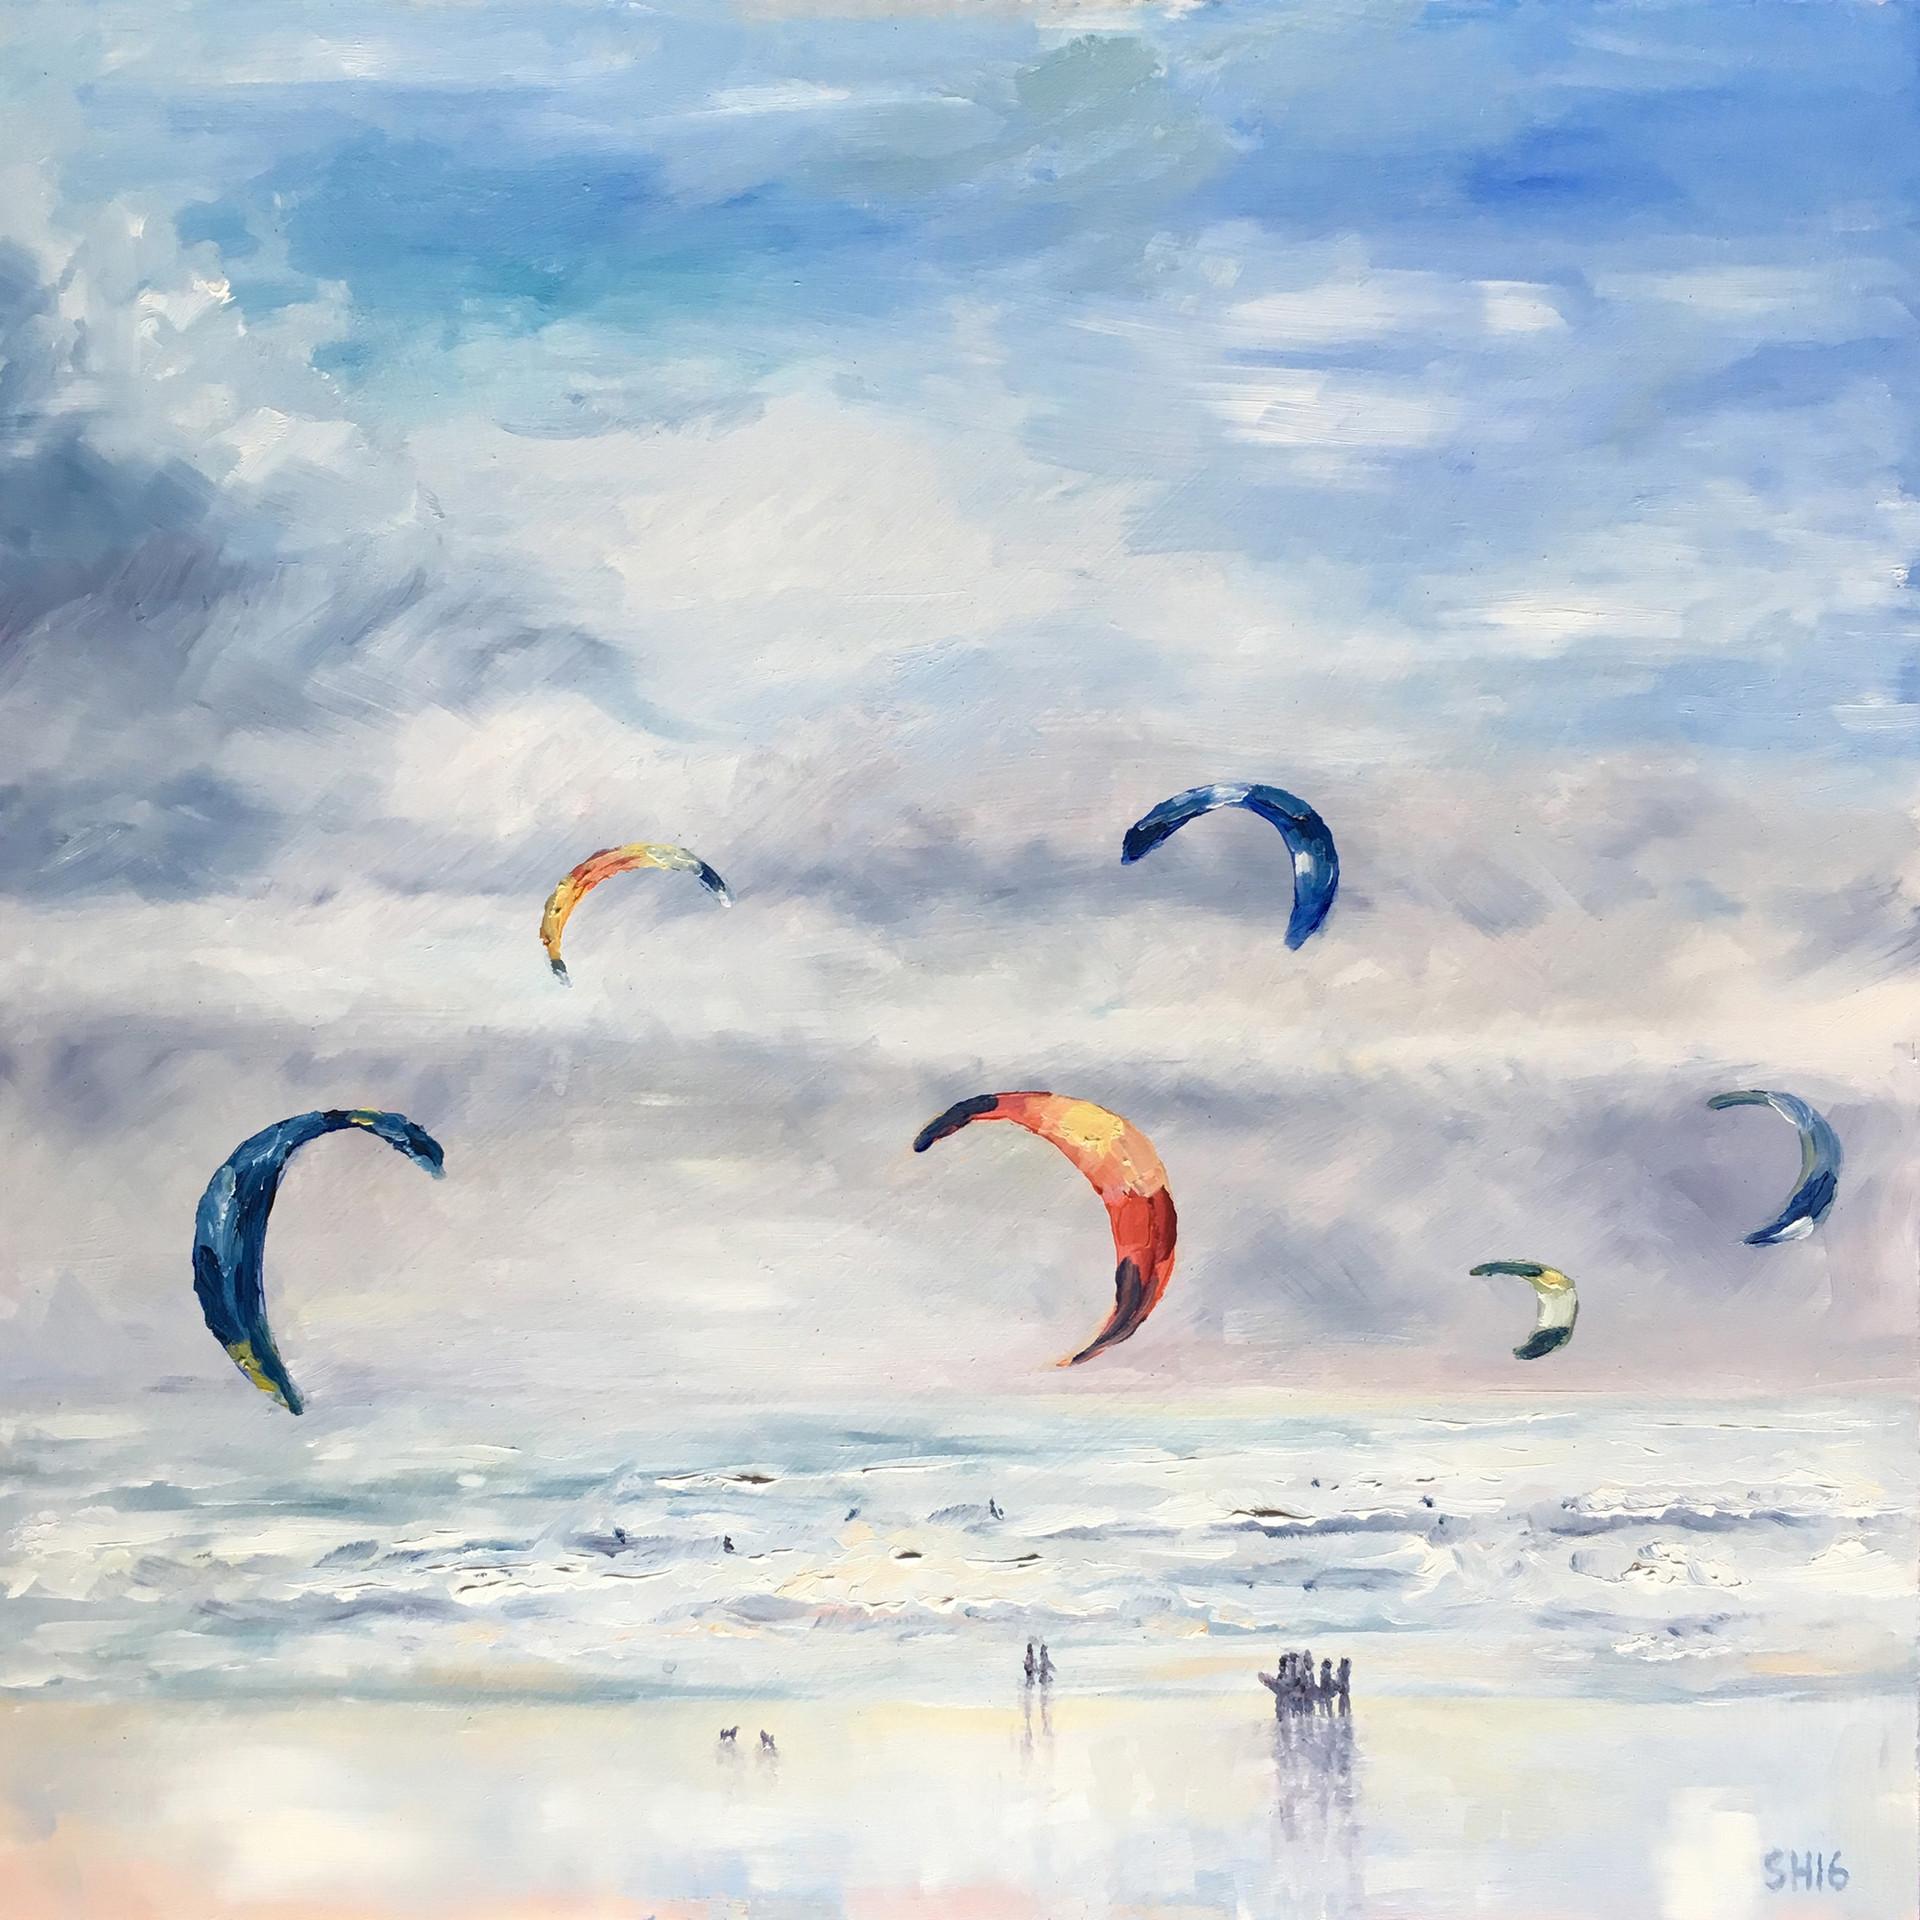 kite surfers 1.jpg